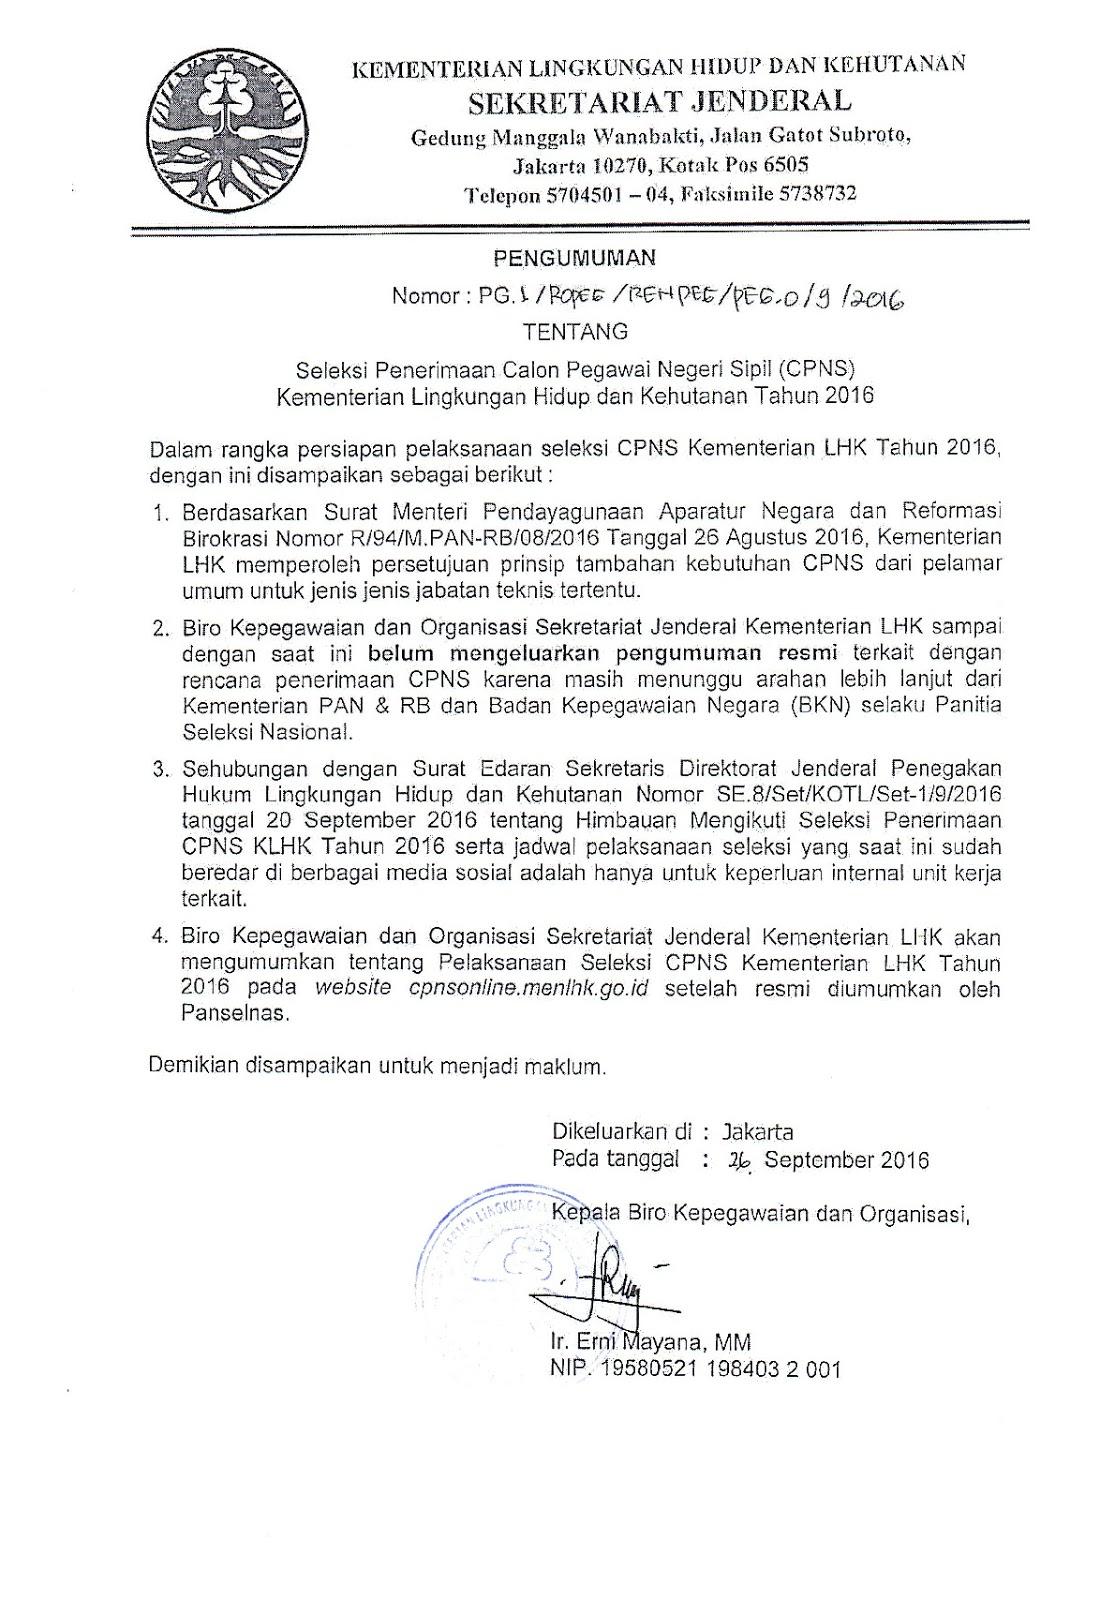 Seleksi Cpns Kementerian Lingkungan Hidup Dan Kehutanan